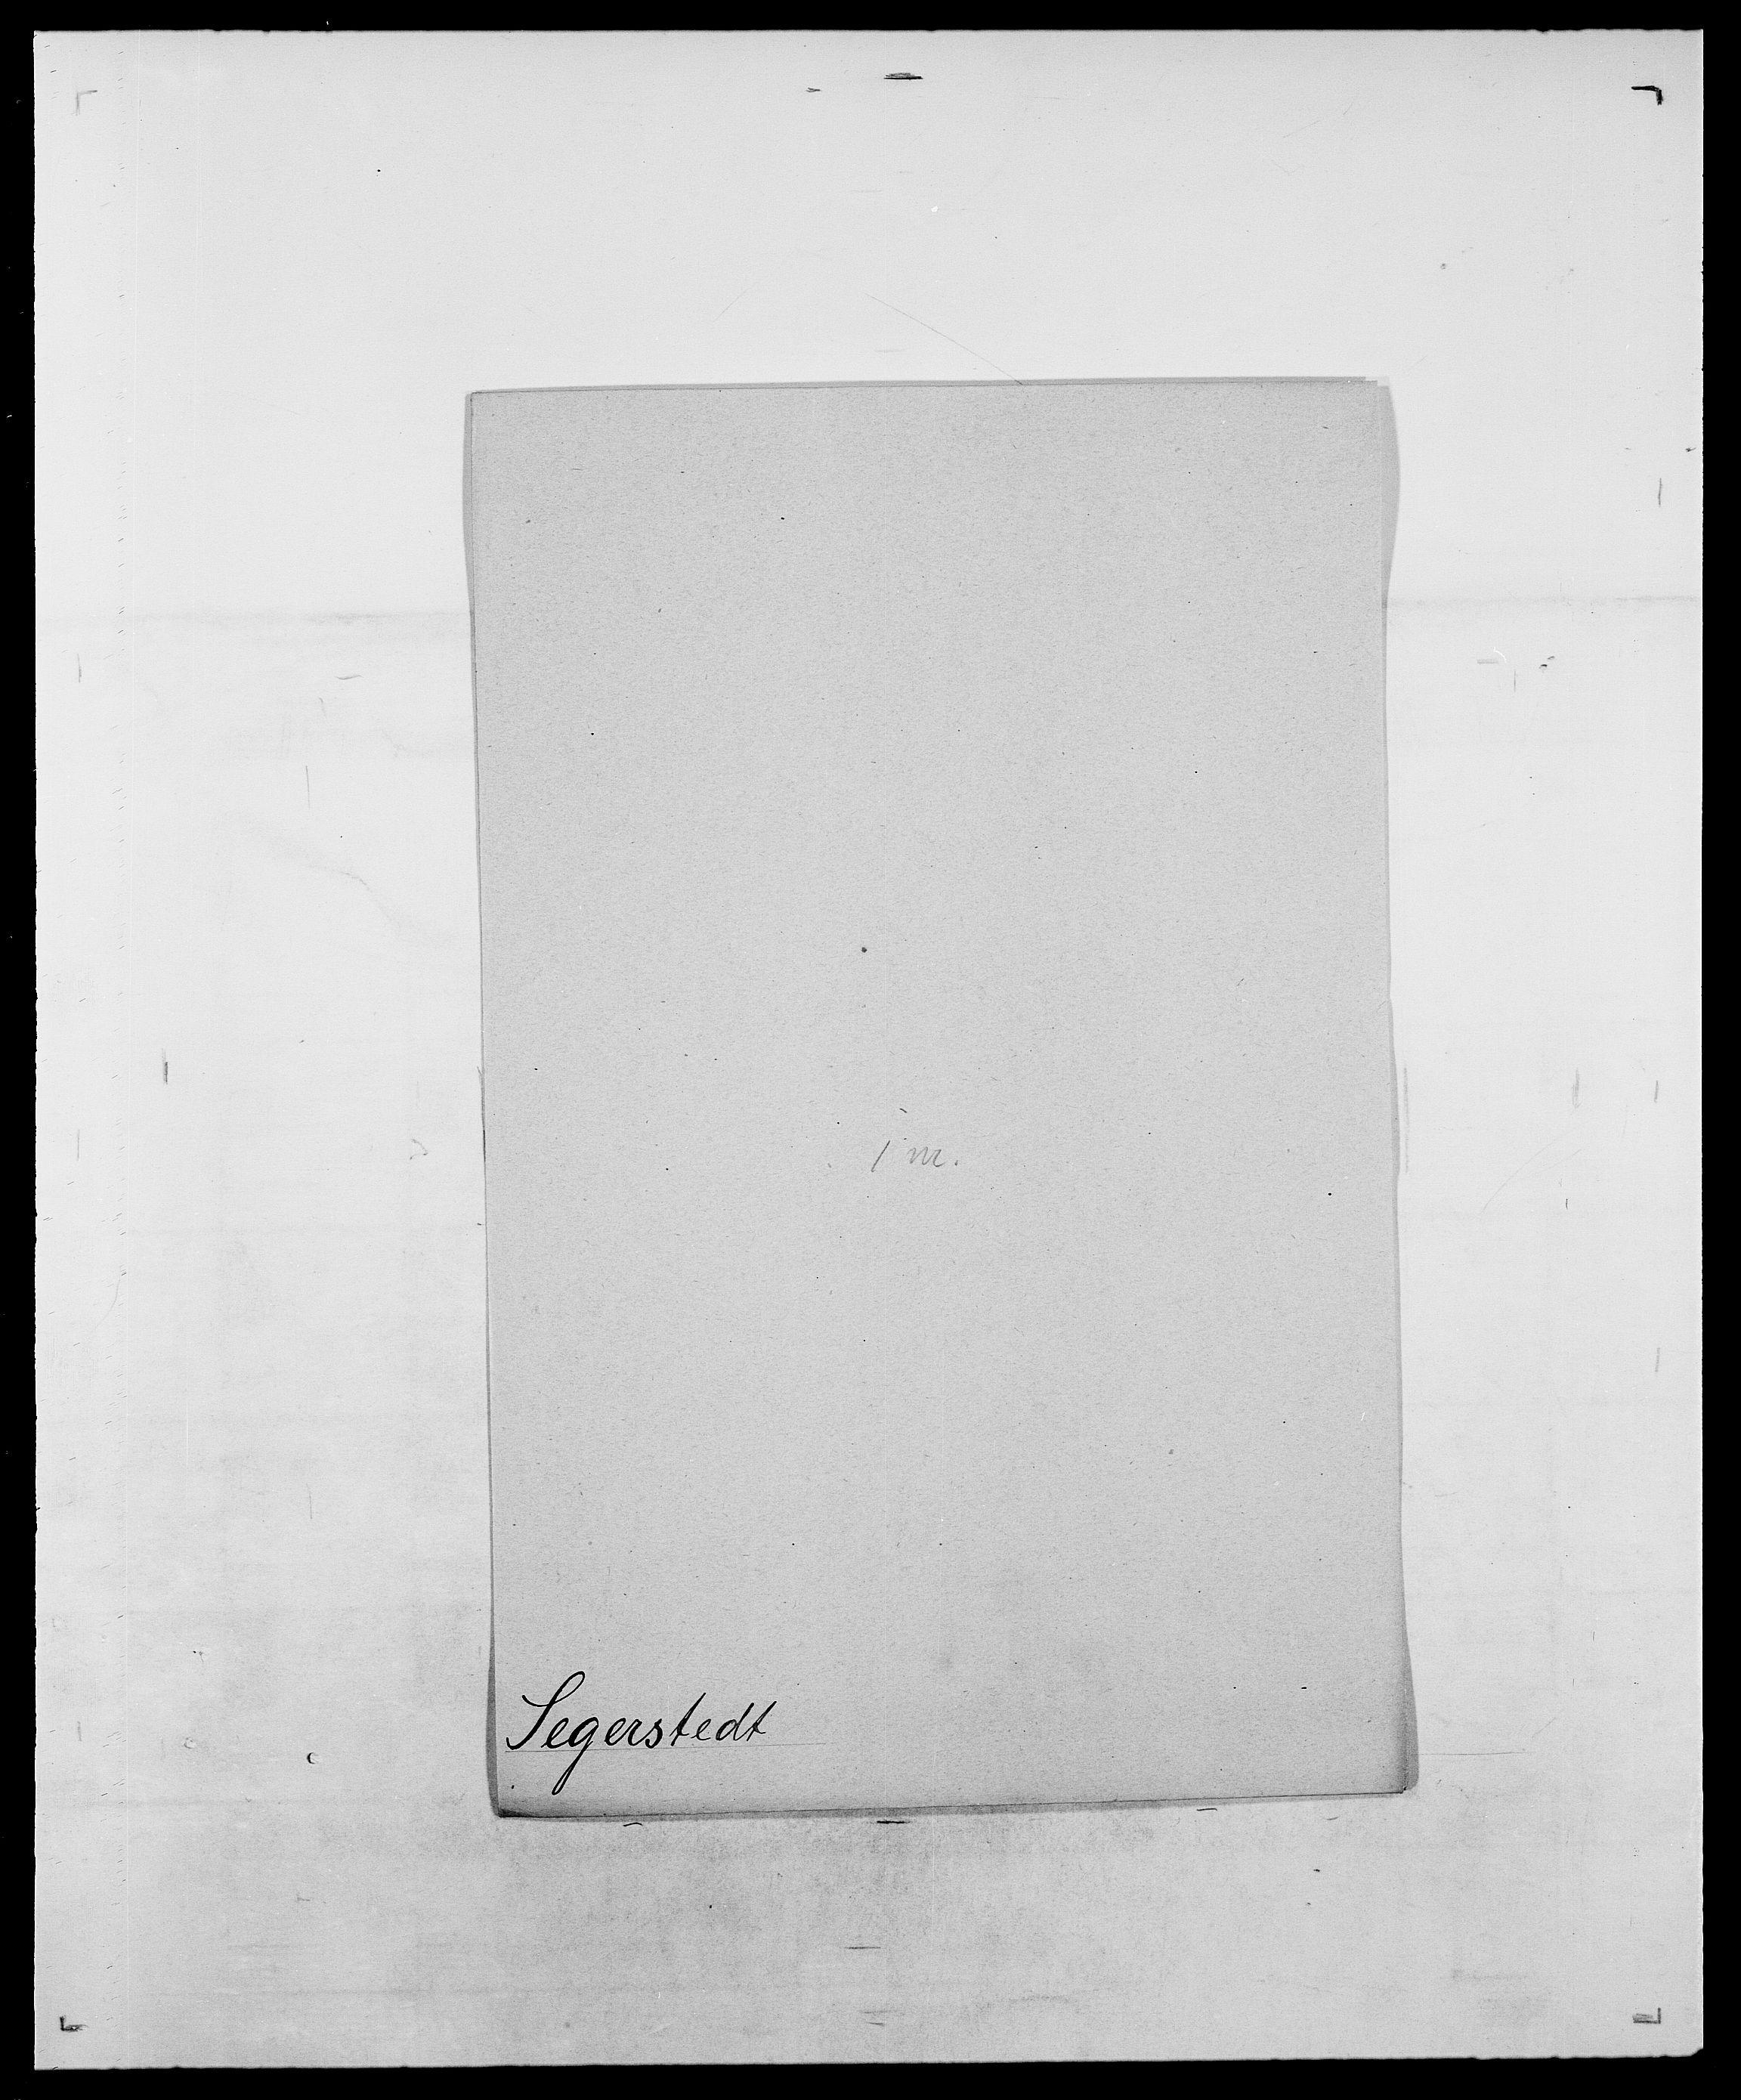 SAO, Delgobe, Charles Antoine - samling, D/Da/L0035: Schnabel - sjetman, s. 593